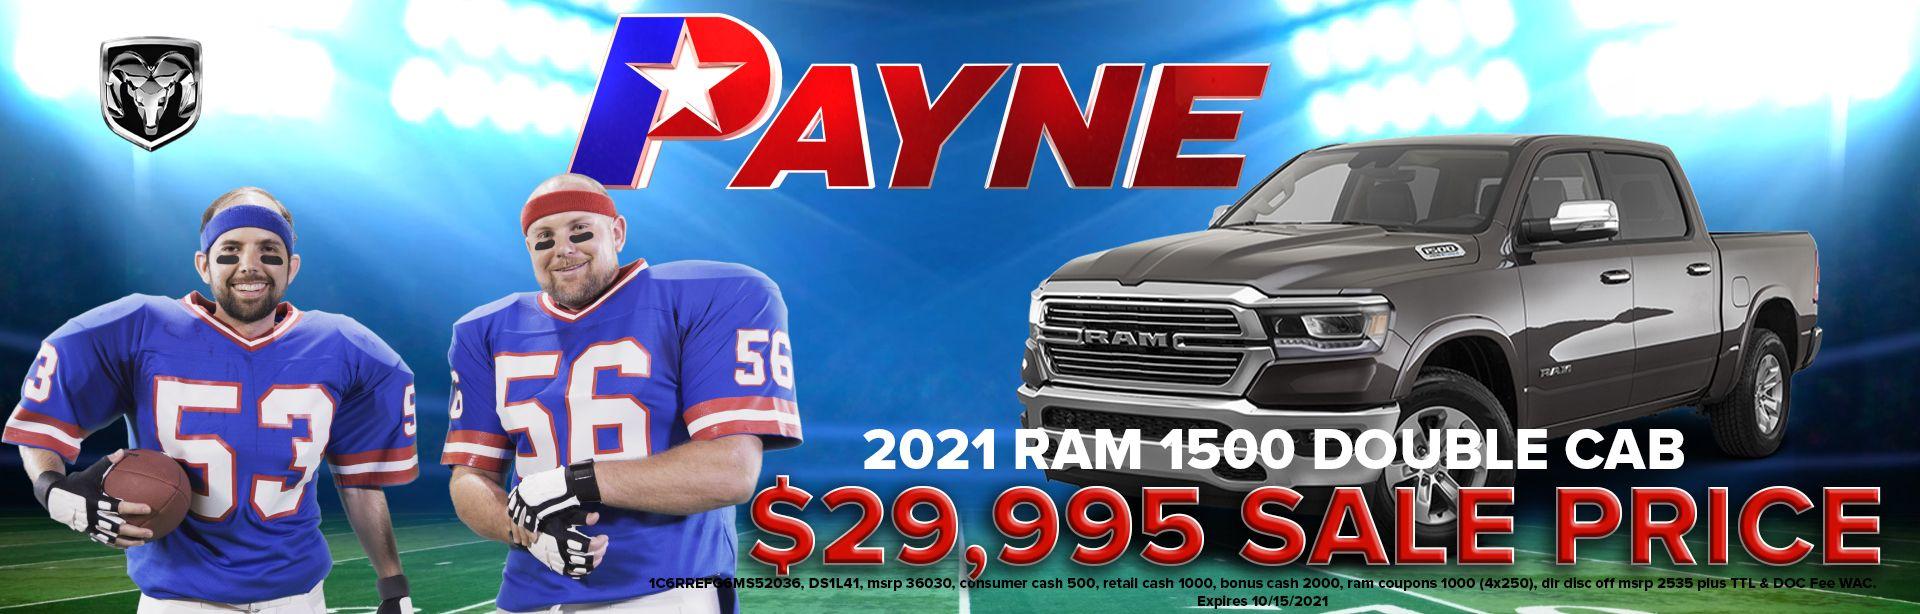 Get A 2021 RAM 1500 Double Cab for 29,995  Payne Edinburg CDJR  Edinburg, TX